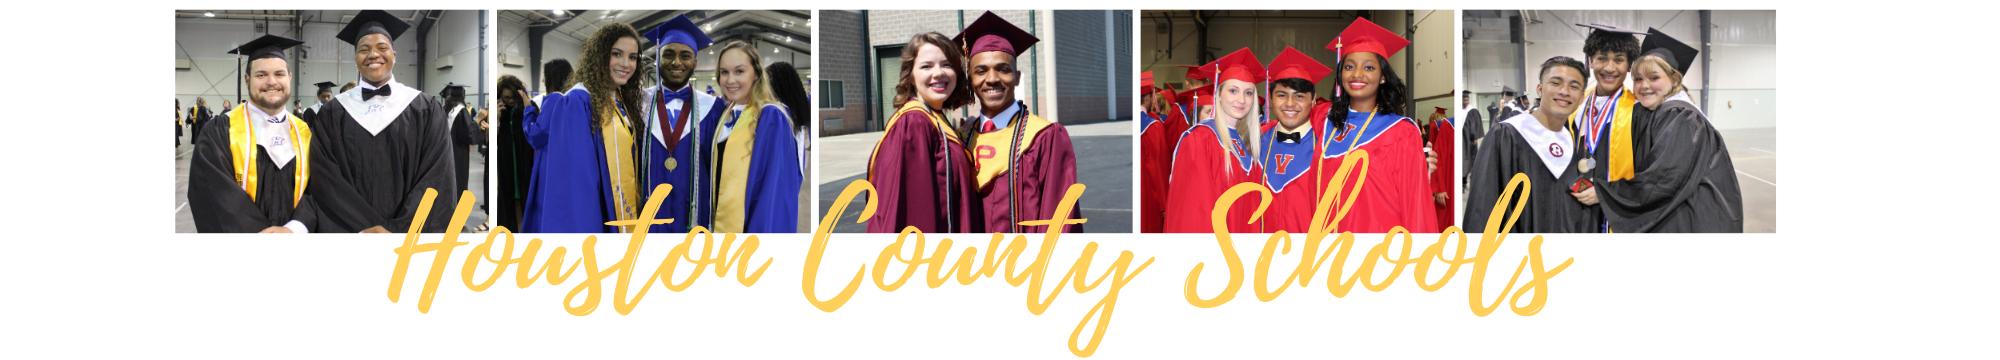 Graduation Collage Image